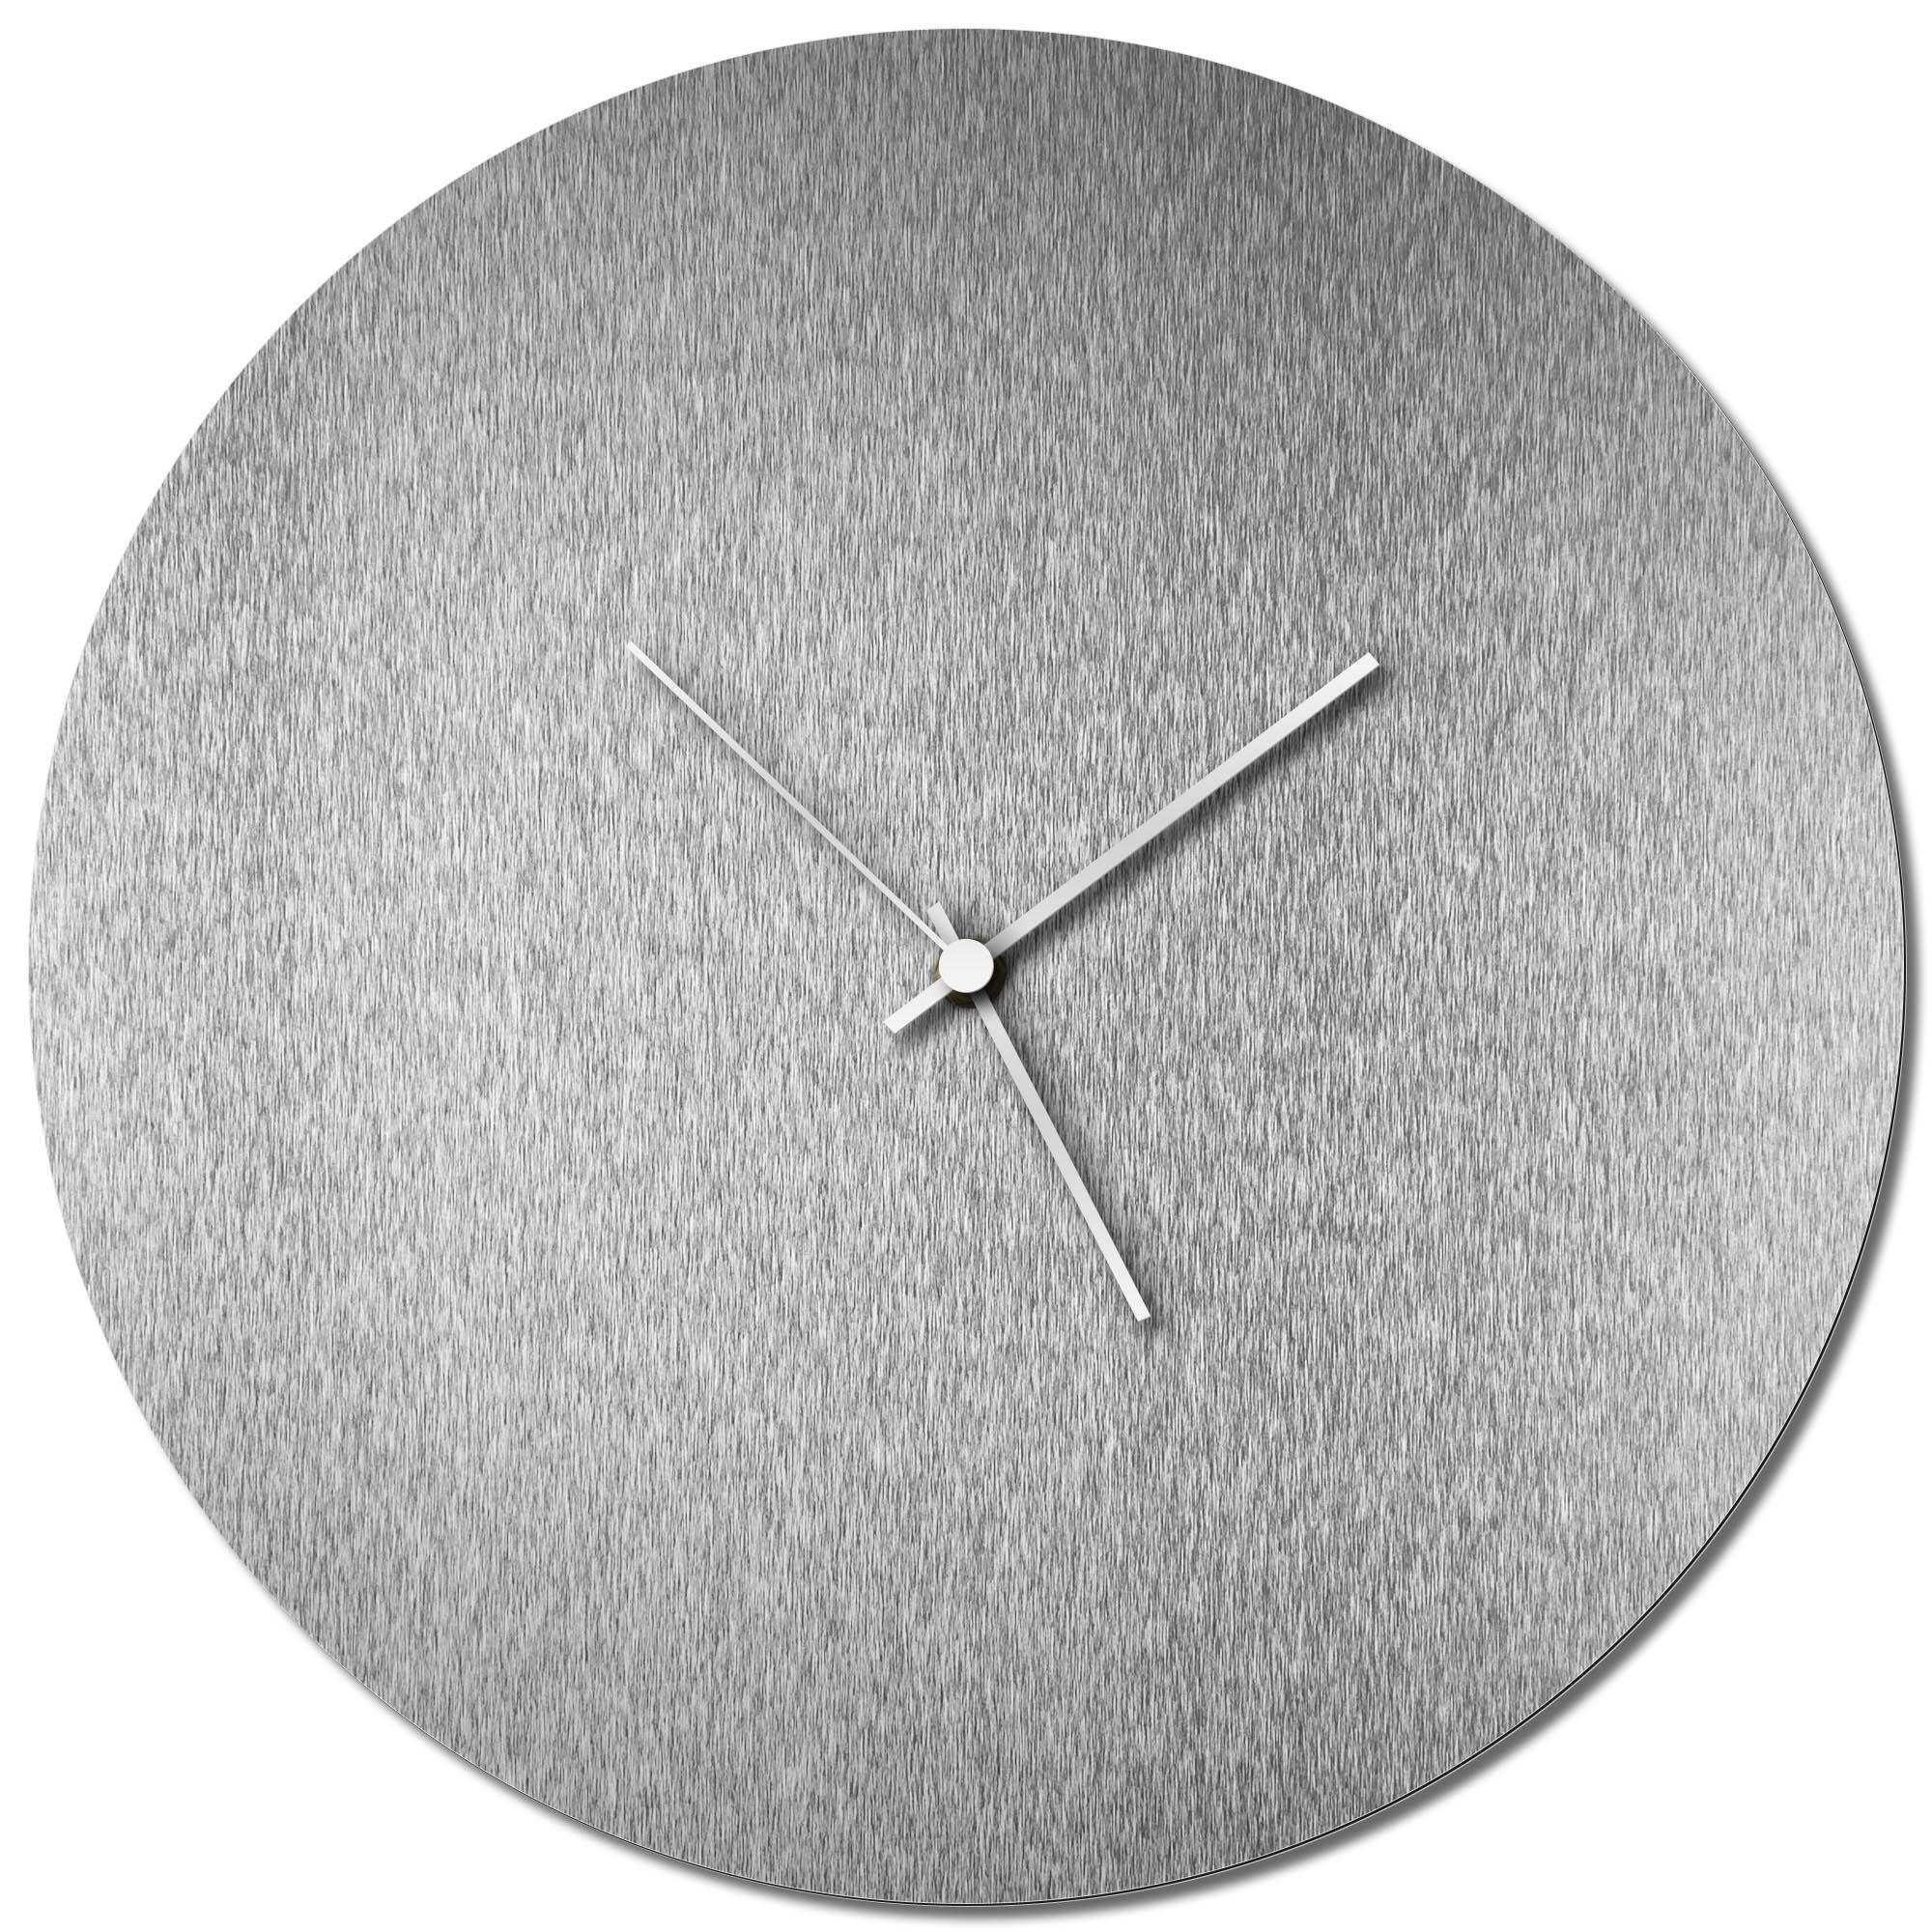 Adam Schwoeppe 'Silversmith Circle Clock White' Midcentury Modern Style Wall Clock